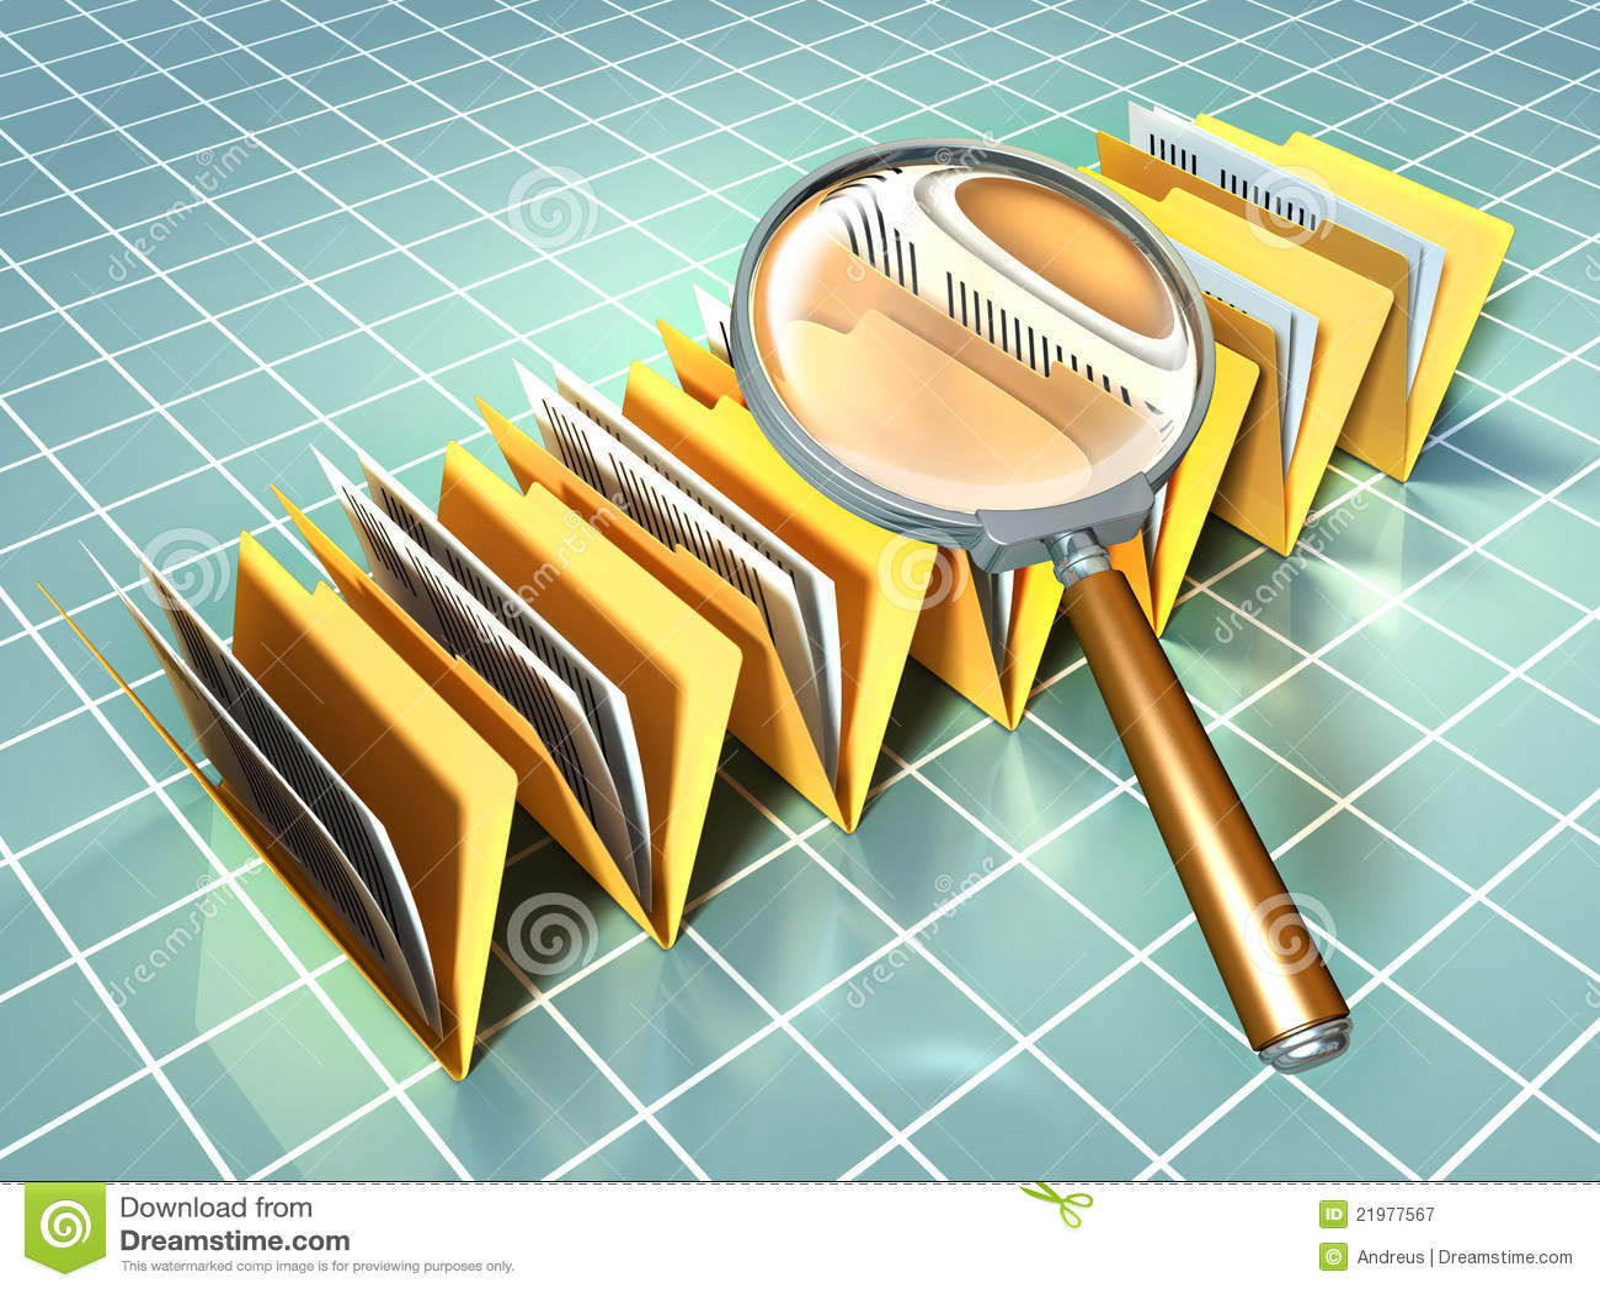 Analyse de document photographie stock libre de droits for Photographie de stock